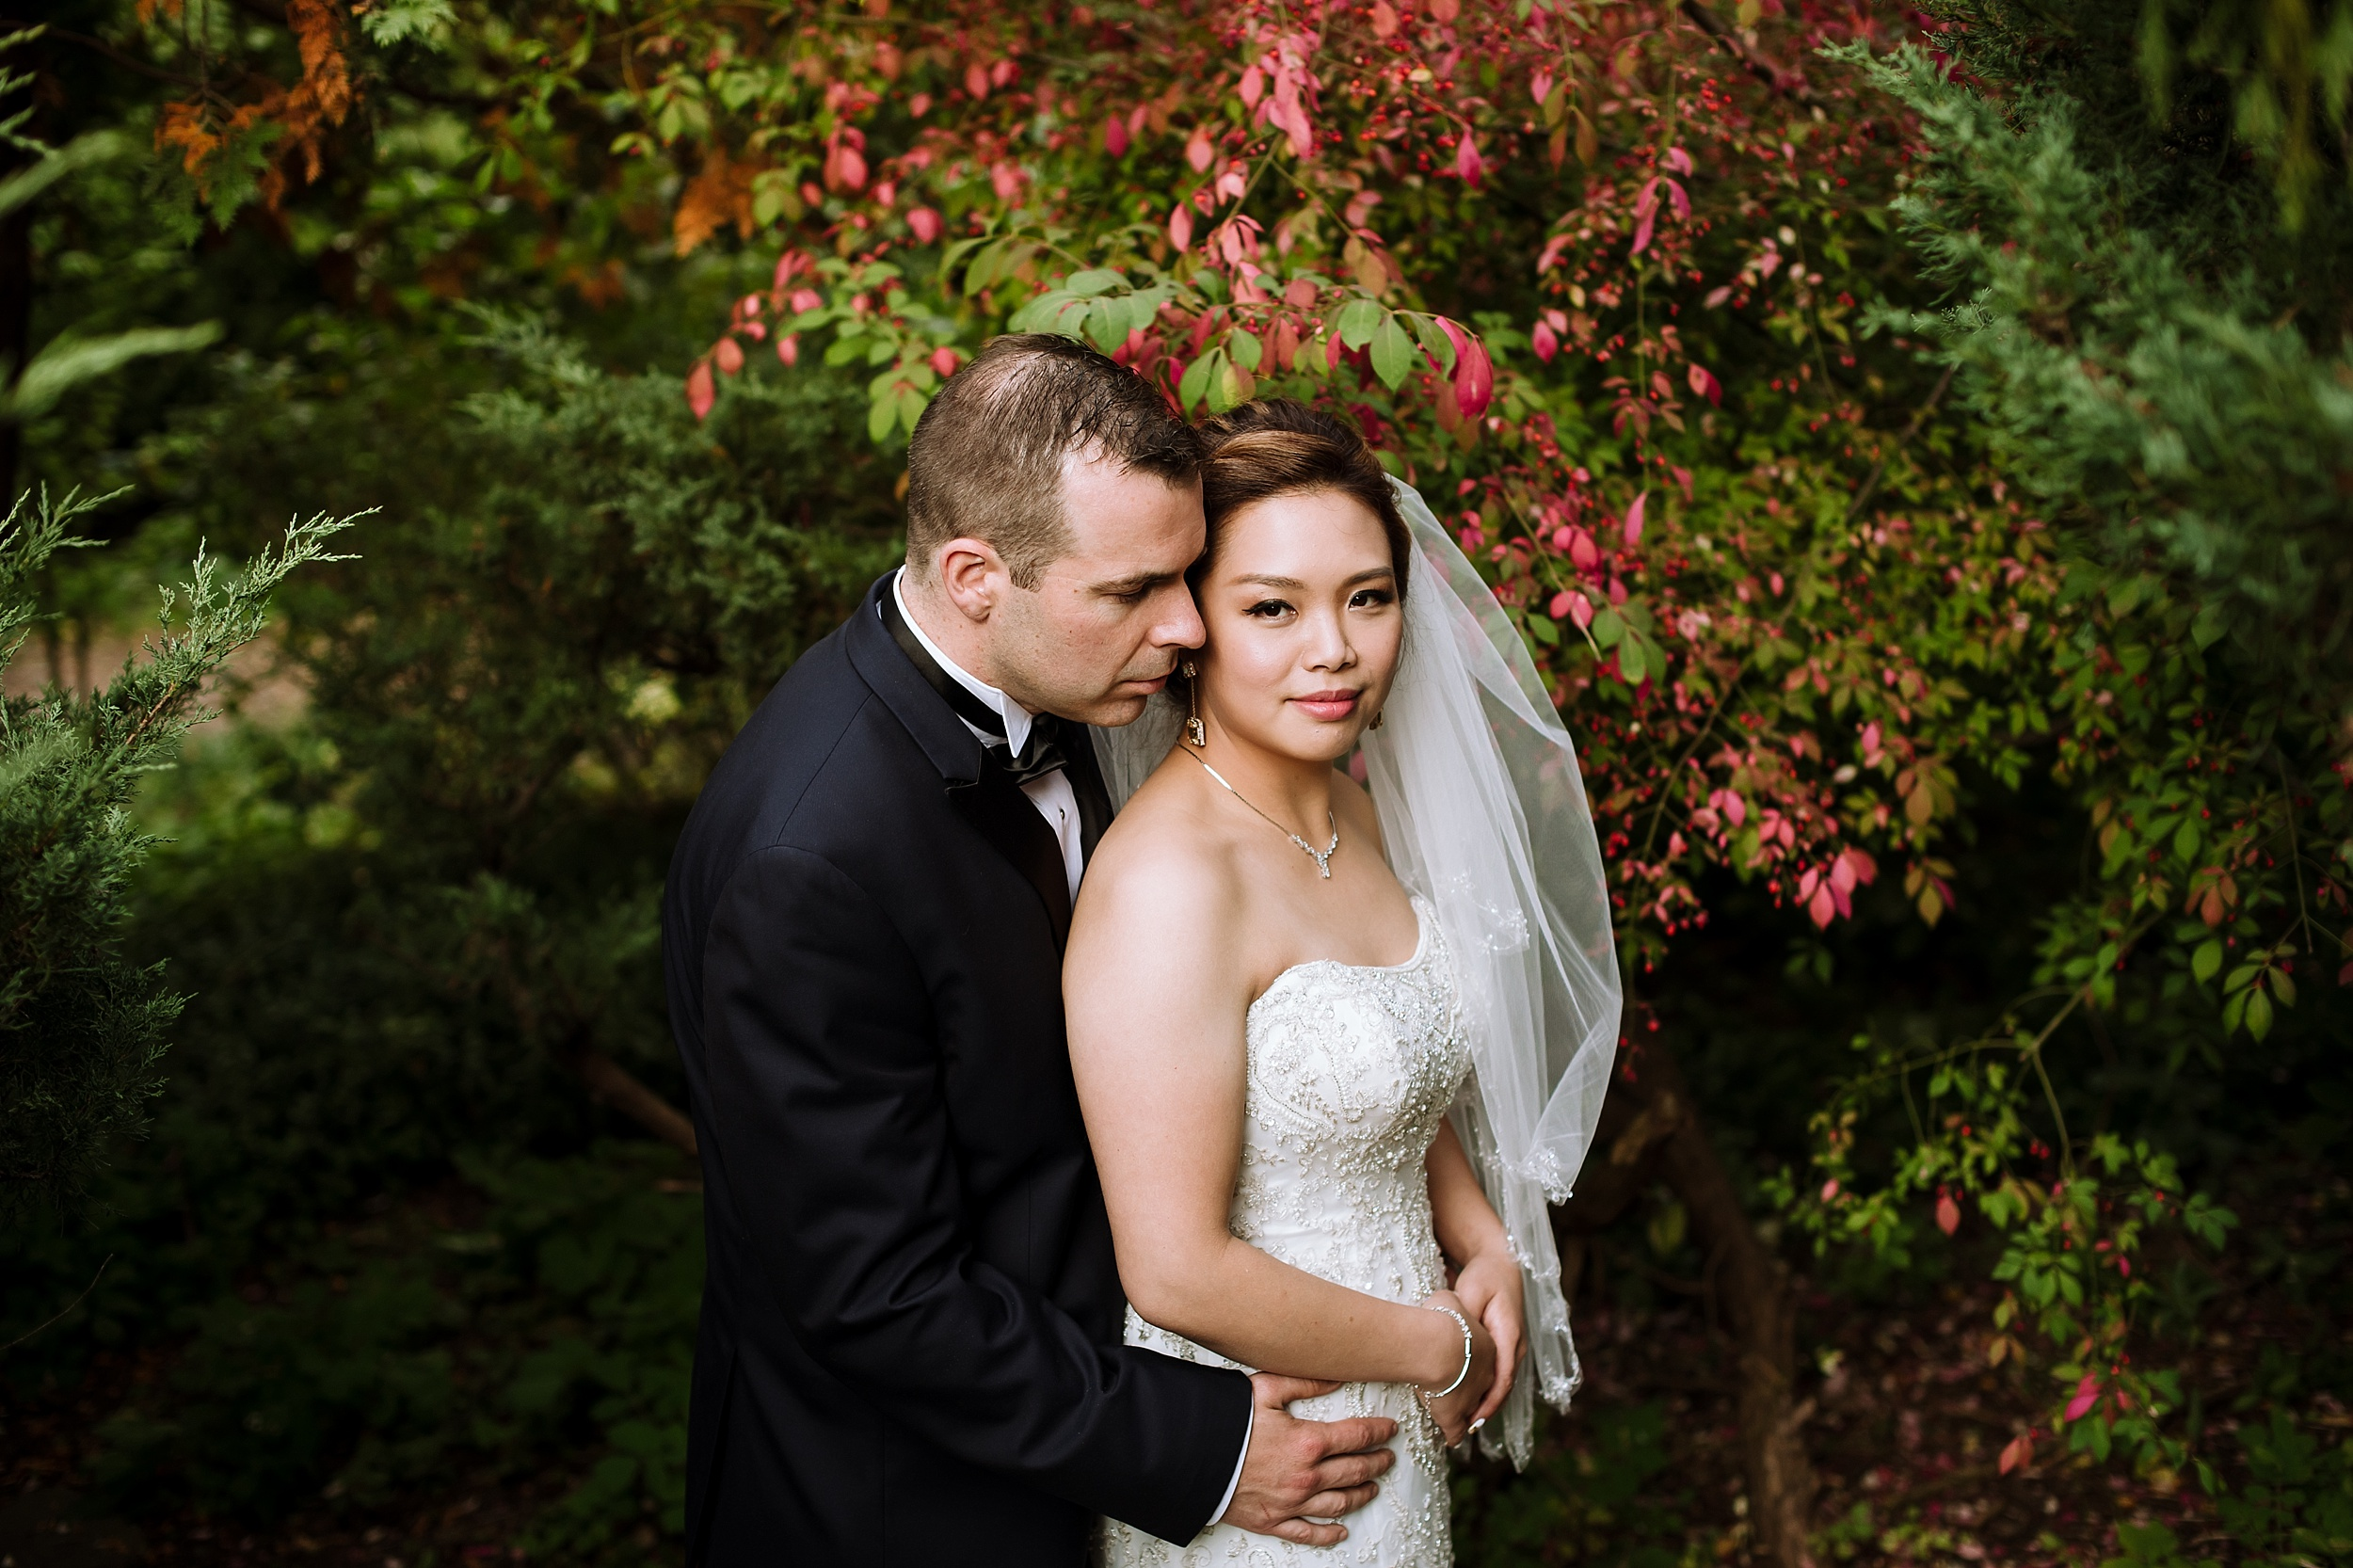 Sunnybrook_Estates_Alexander_Muir_Toronto_Wedding_Photographer_0013.jpg